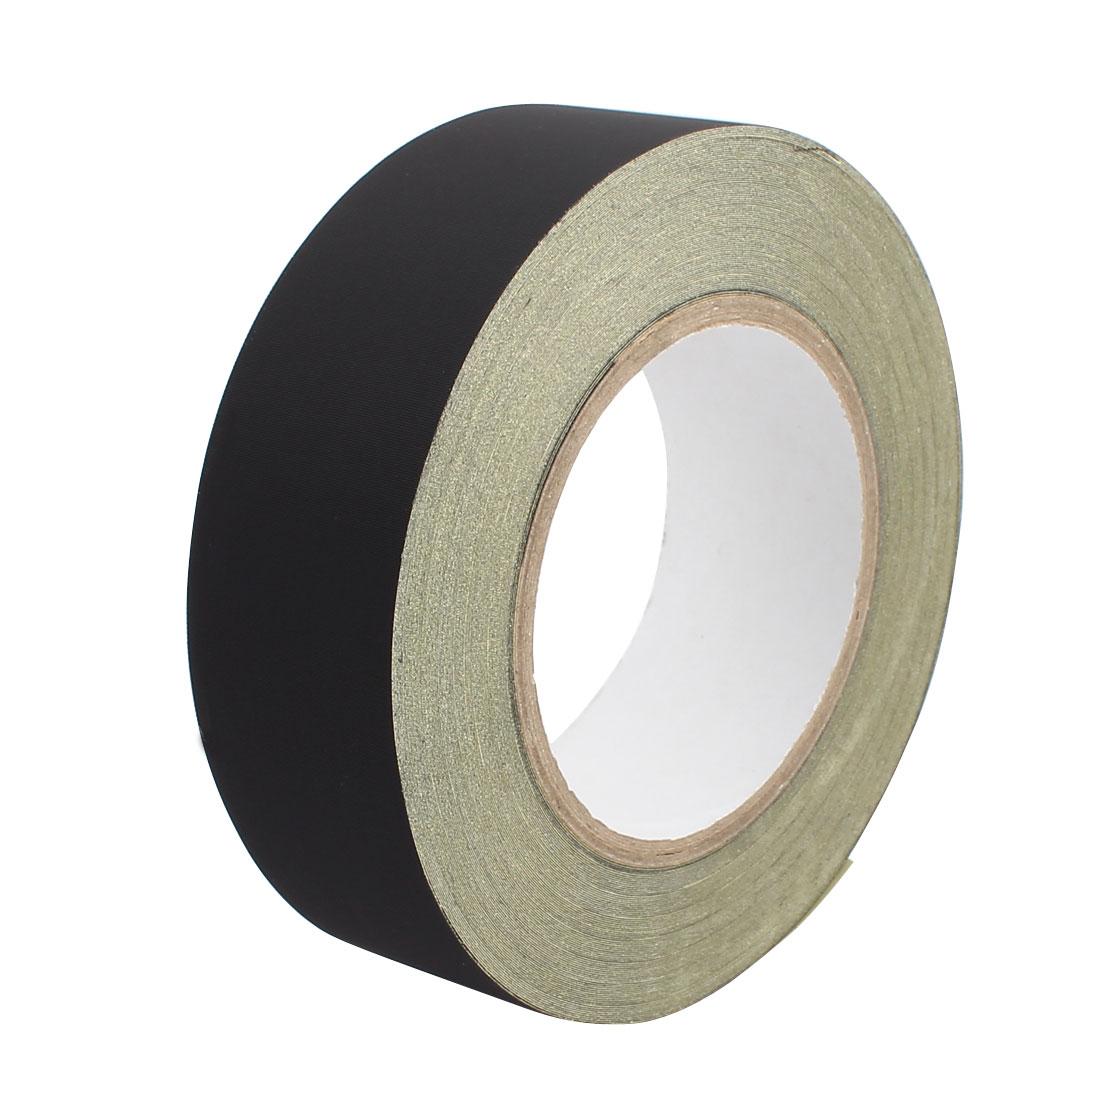 40mm Width Black Insulating Acetate Cloth Adhesive Tape For Laptop Transformer Coils Repair